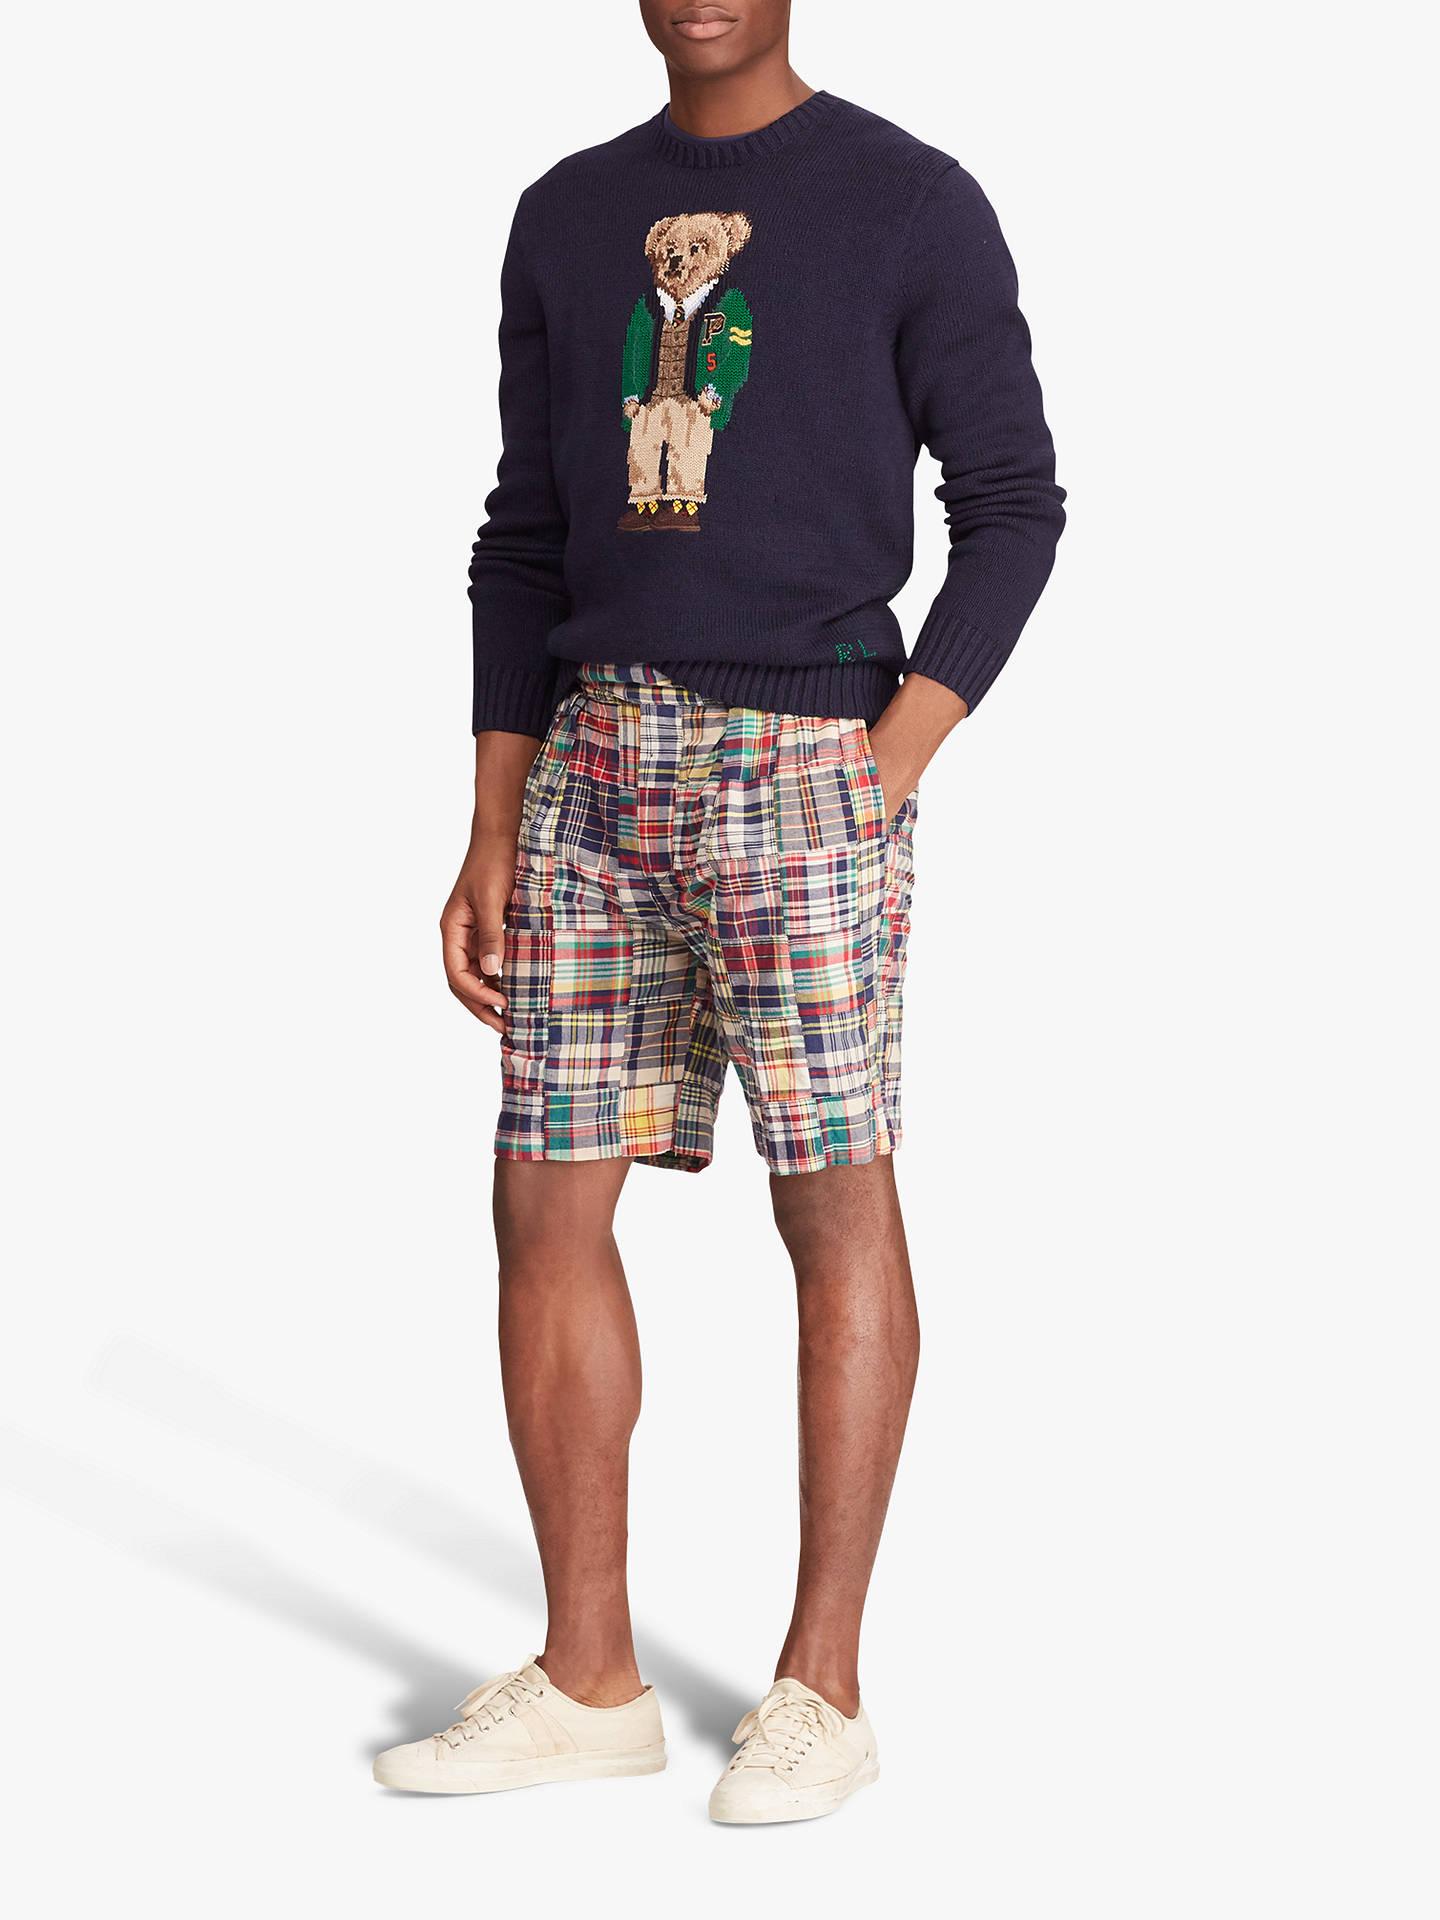 ea7370723a1 ... Buy Polo Ralph Lauren University Bear Sweater